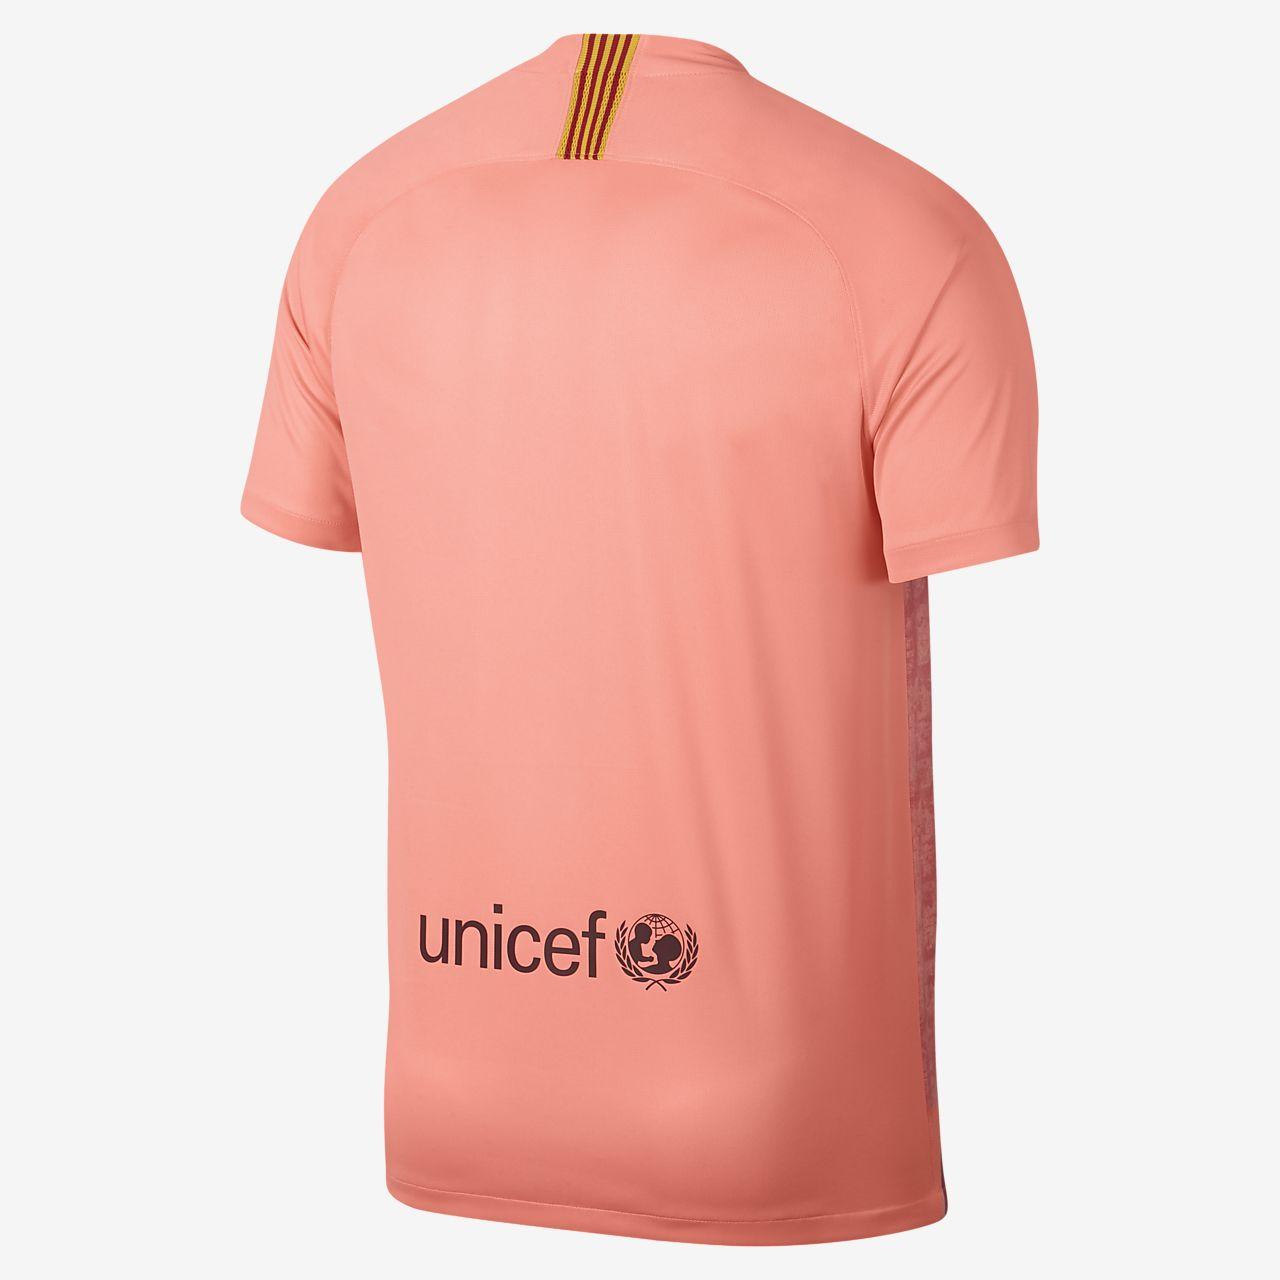 99290deb5 2018 19 FC Barcelona Stadium Third Men s Soccer Jersey. Nike.com